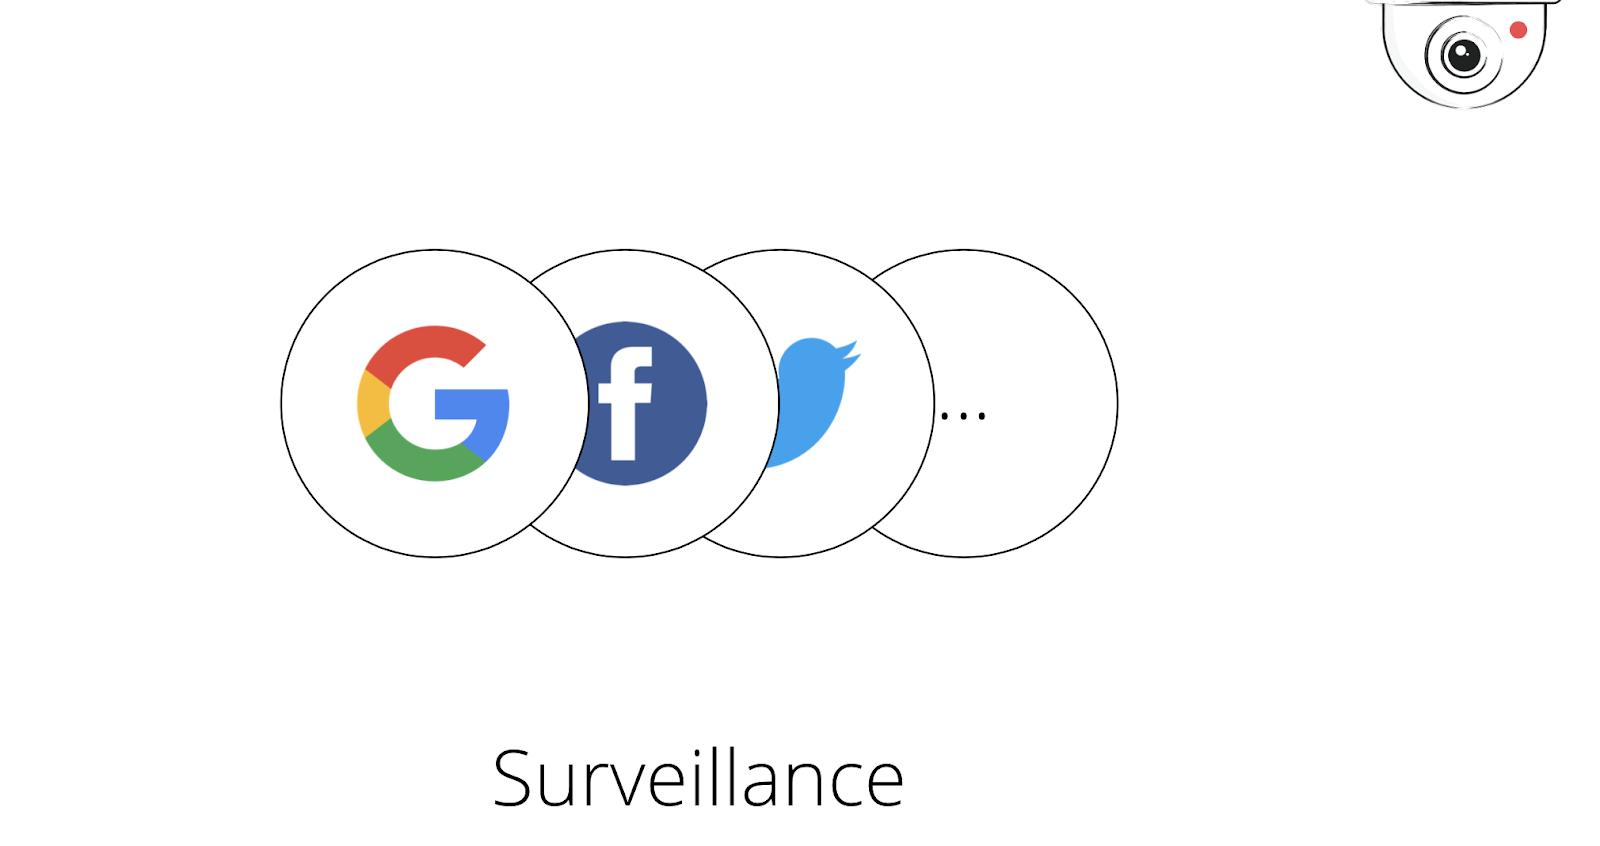 Google, Facebook, Twitter platform icons